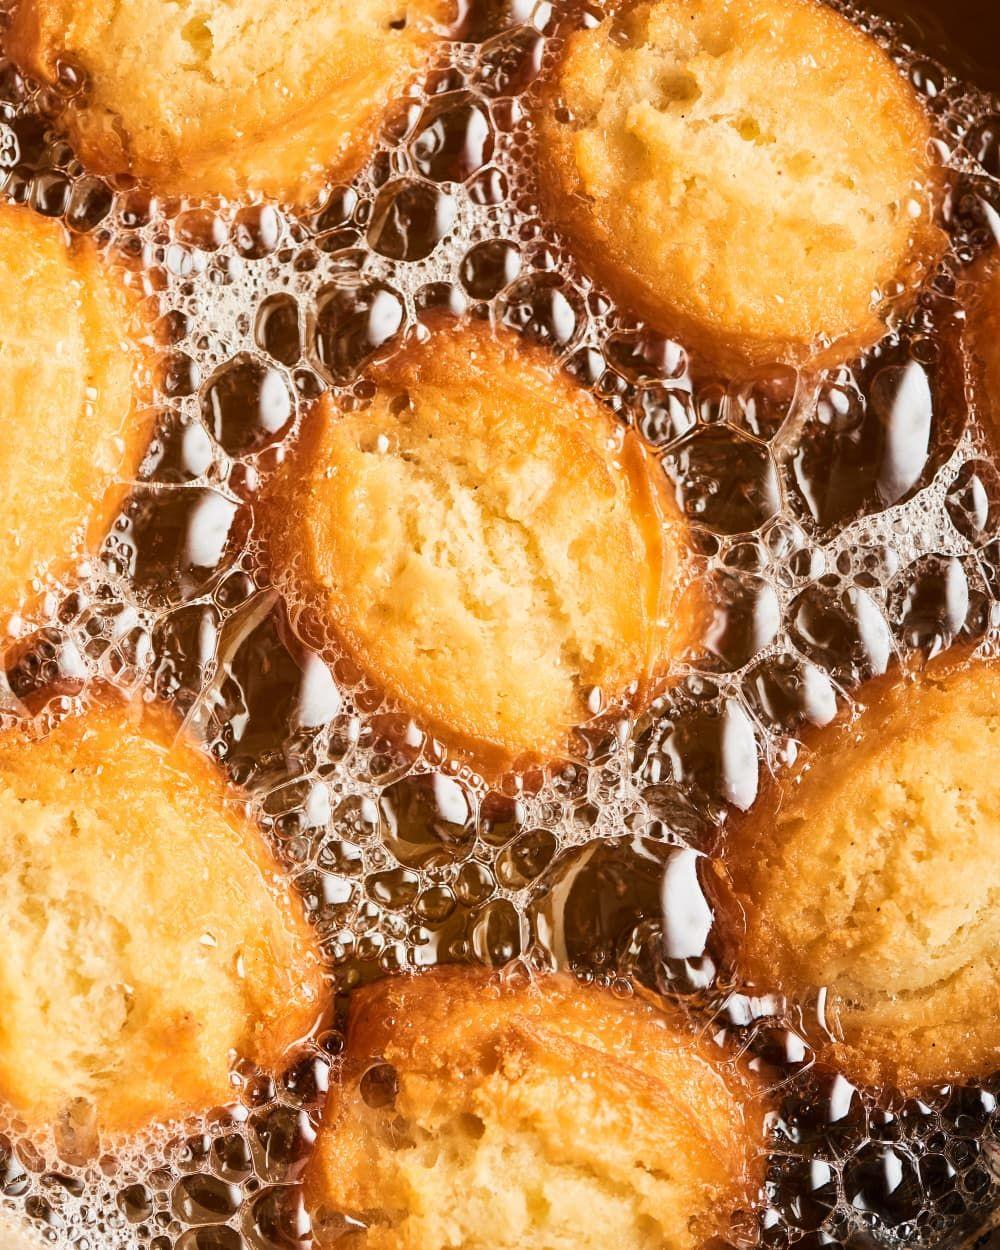 Glazed Donuts But Better The Story Of La S Beloved Buttermilk Bars In 2020 How Sweet Eats Donut Glaze Buttermilk Bars Recipe